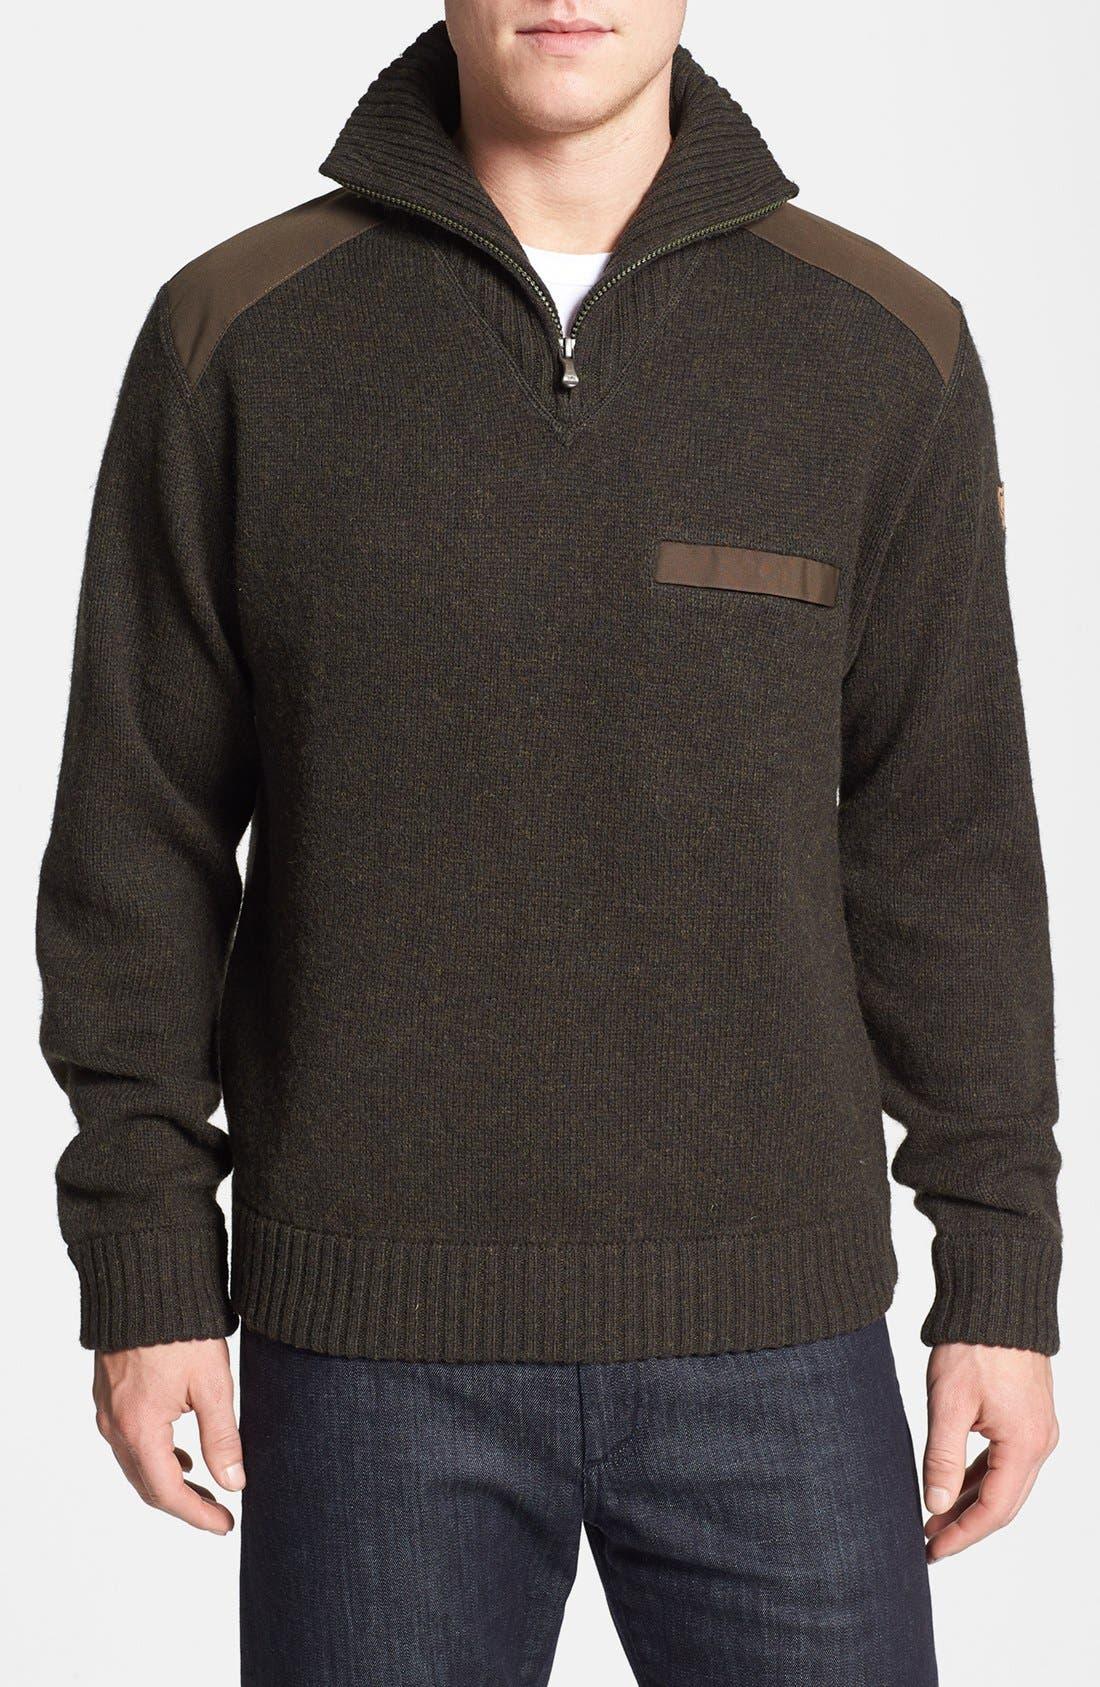 Alternate Image 1 Selected - Fjällräven 'Koster' Quarter Zip Sweater